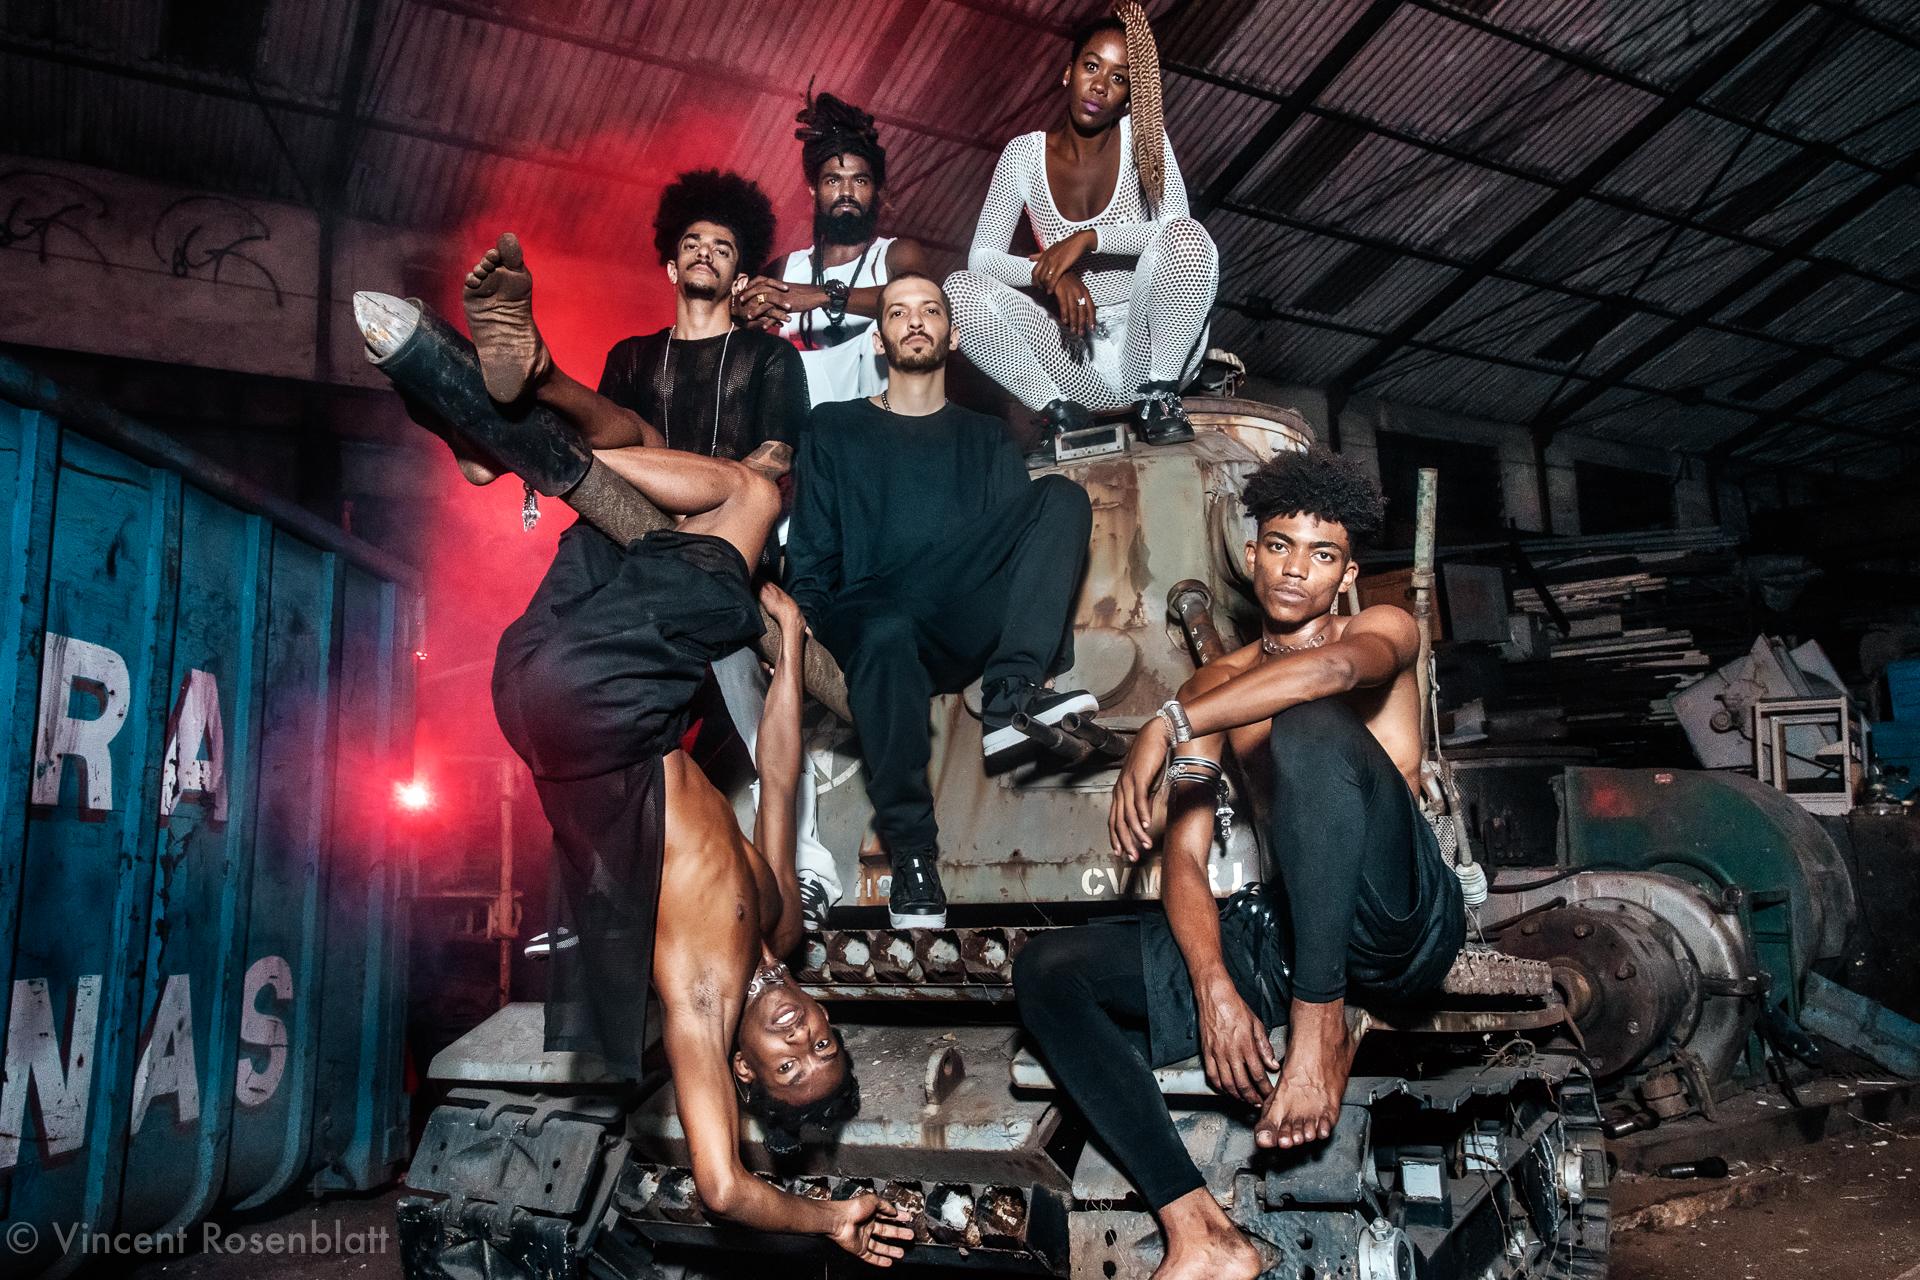 Heavy Baile - 2018.DJ Thai - MC Tchelinho - DJ Leo Justi - Dancers : Jonathan Neguebites - Sabrina Ginga & Ronald Sheick.